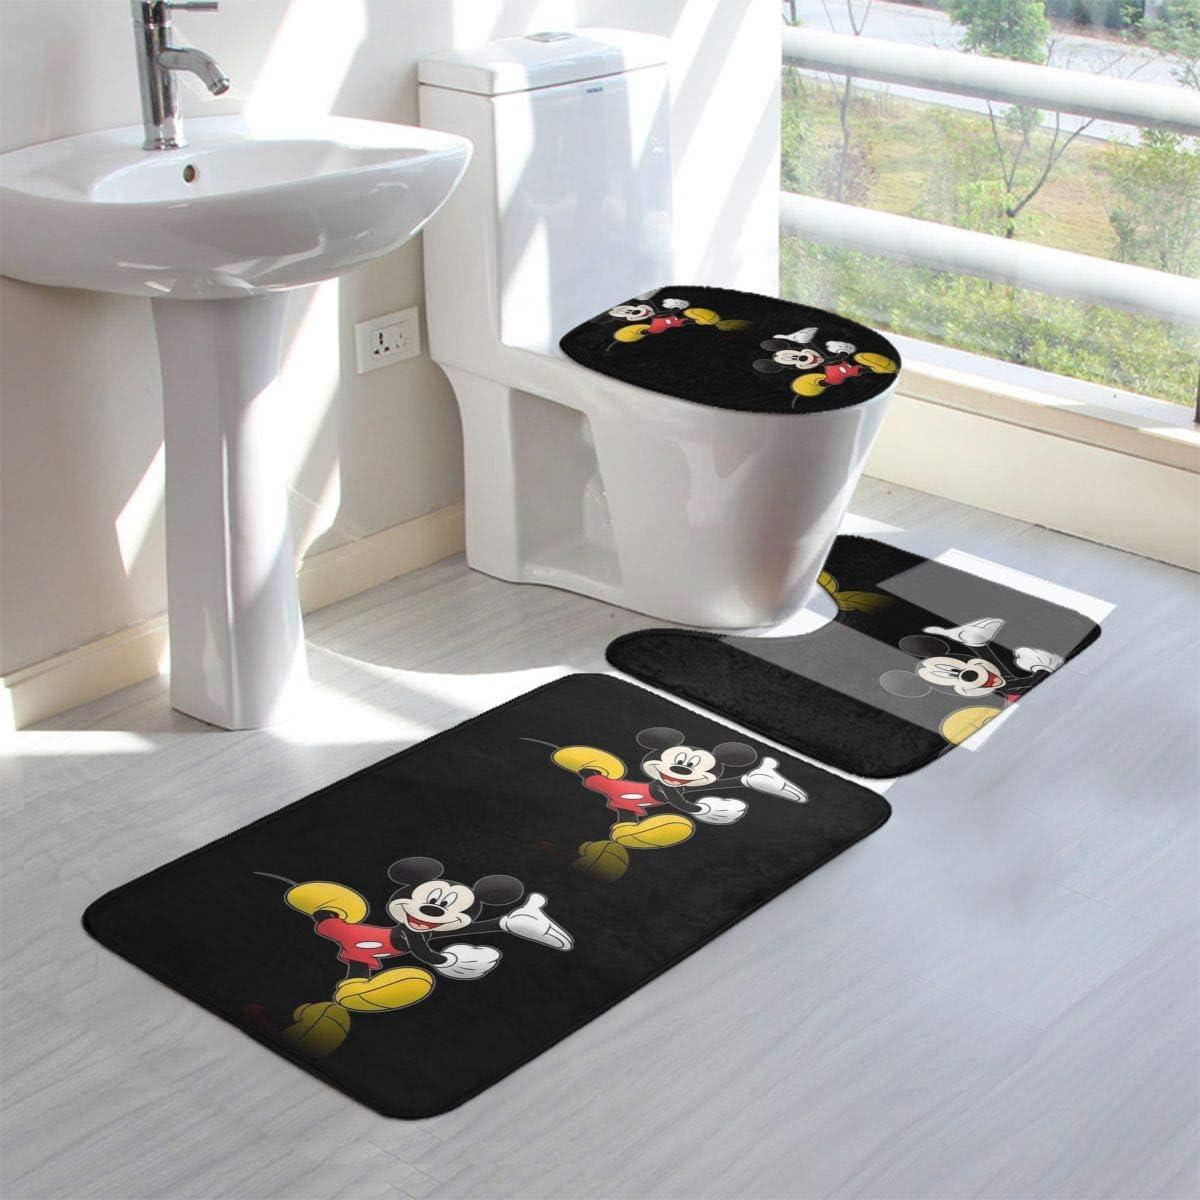 Amazon.de: Happy Mickey Mouse Badteppich-Set 10-teilig Badteppiche